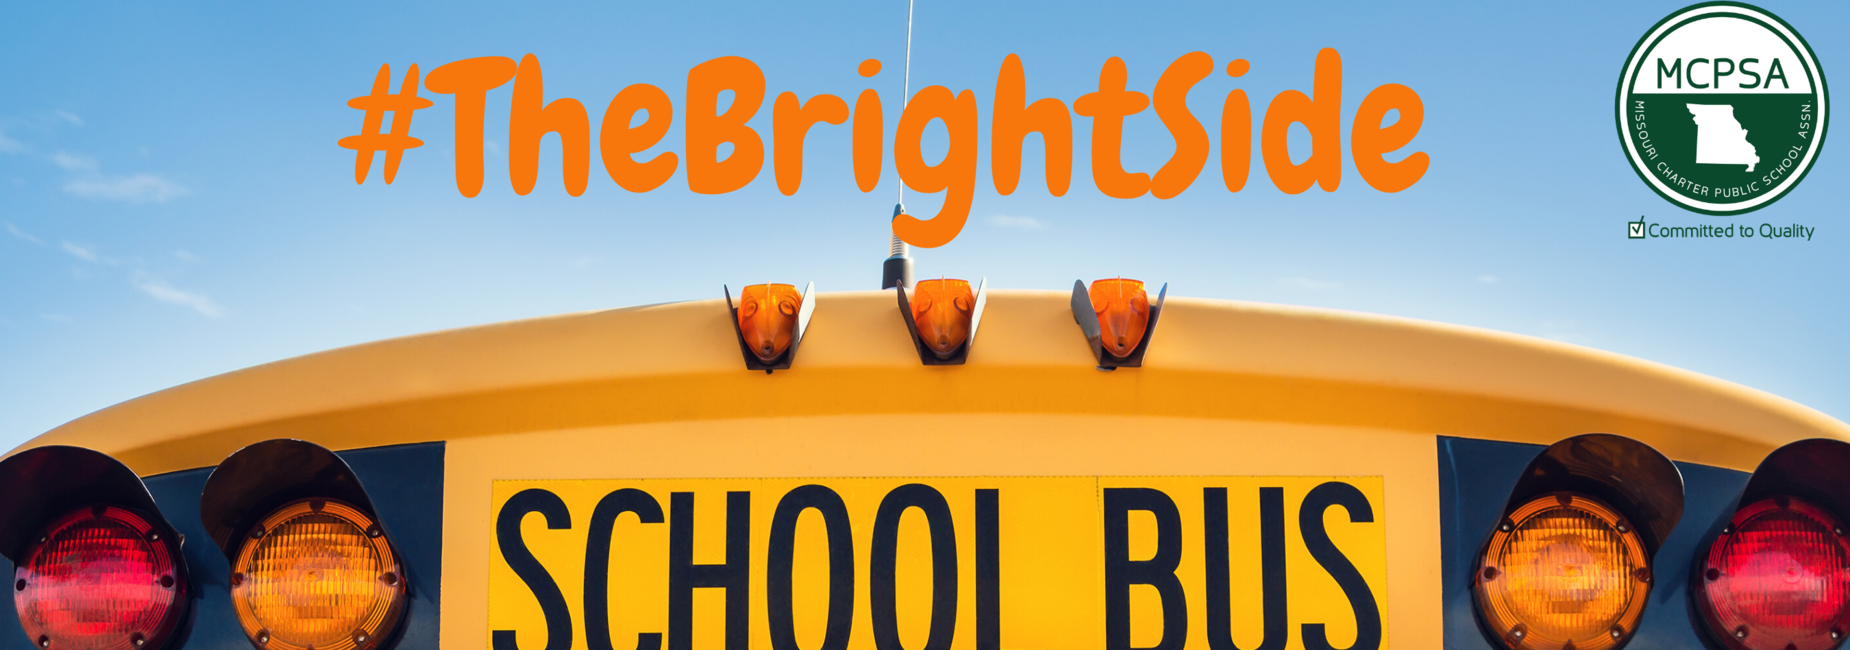 school bus #thebrightside